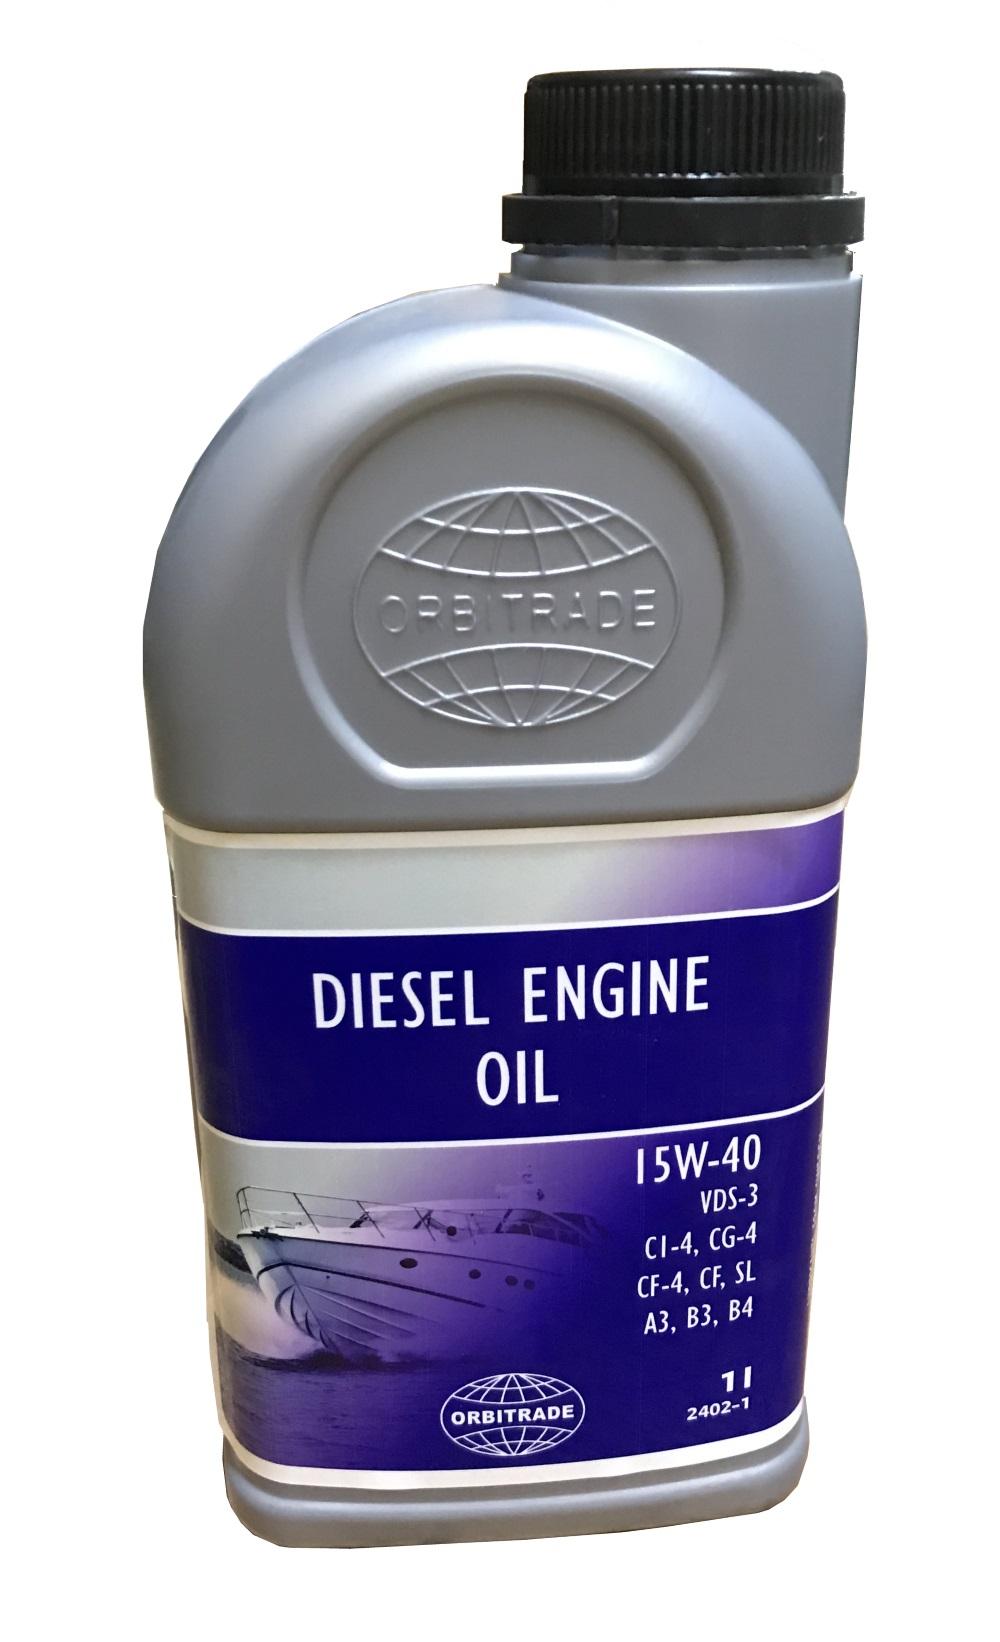 Olja Orbitrade